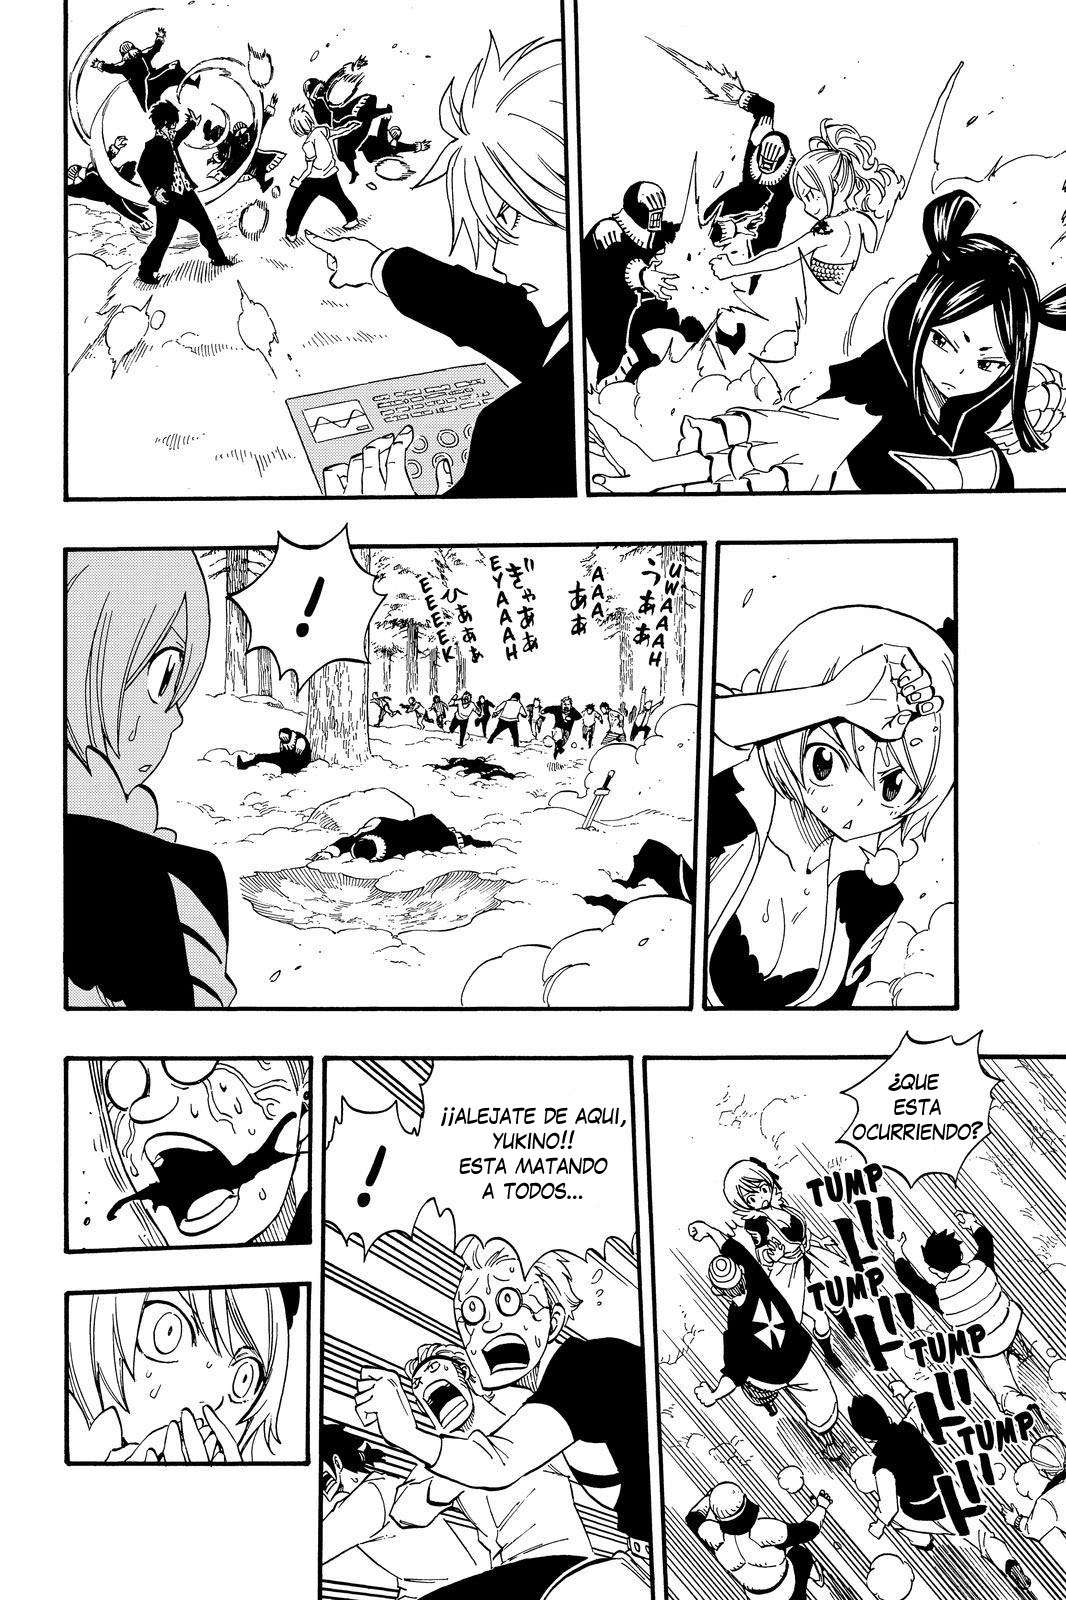 http://c5.ninemanga.com/es_manga/14/78/433855/55a0df4b5a1786cd13a7a8de759859d4.jpg Page 12